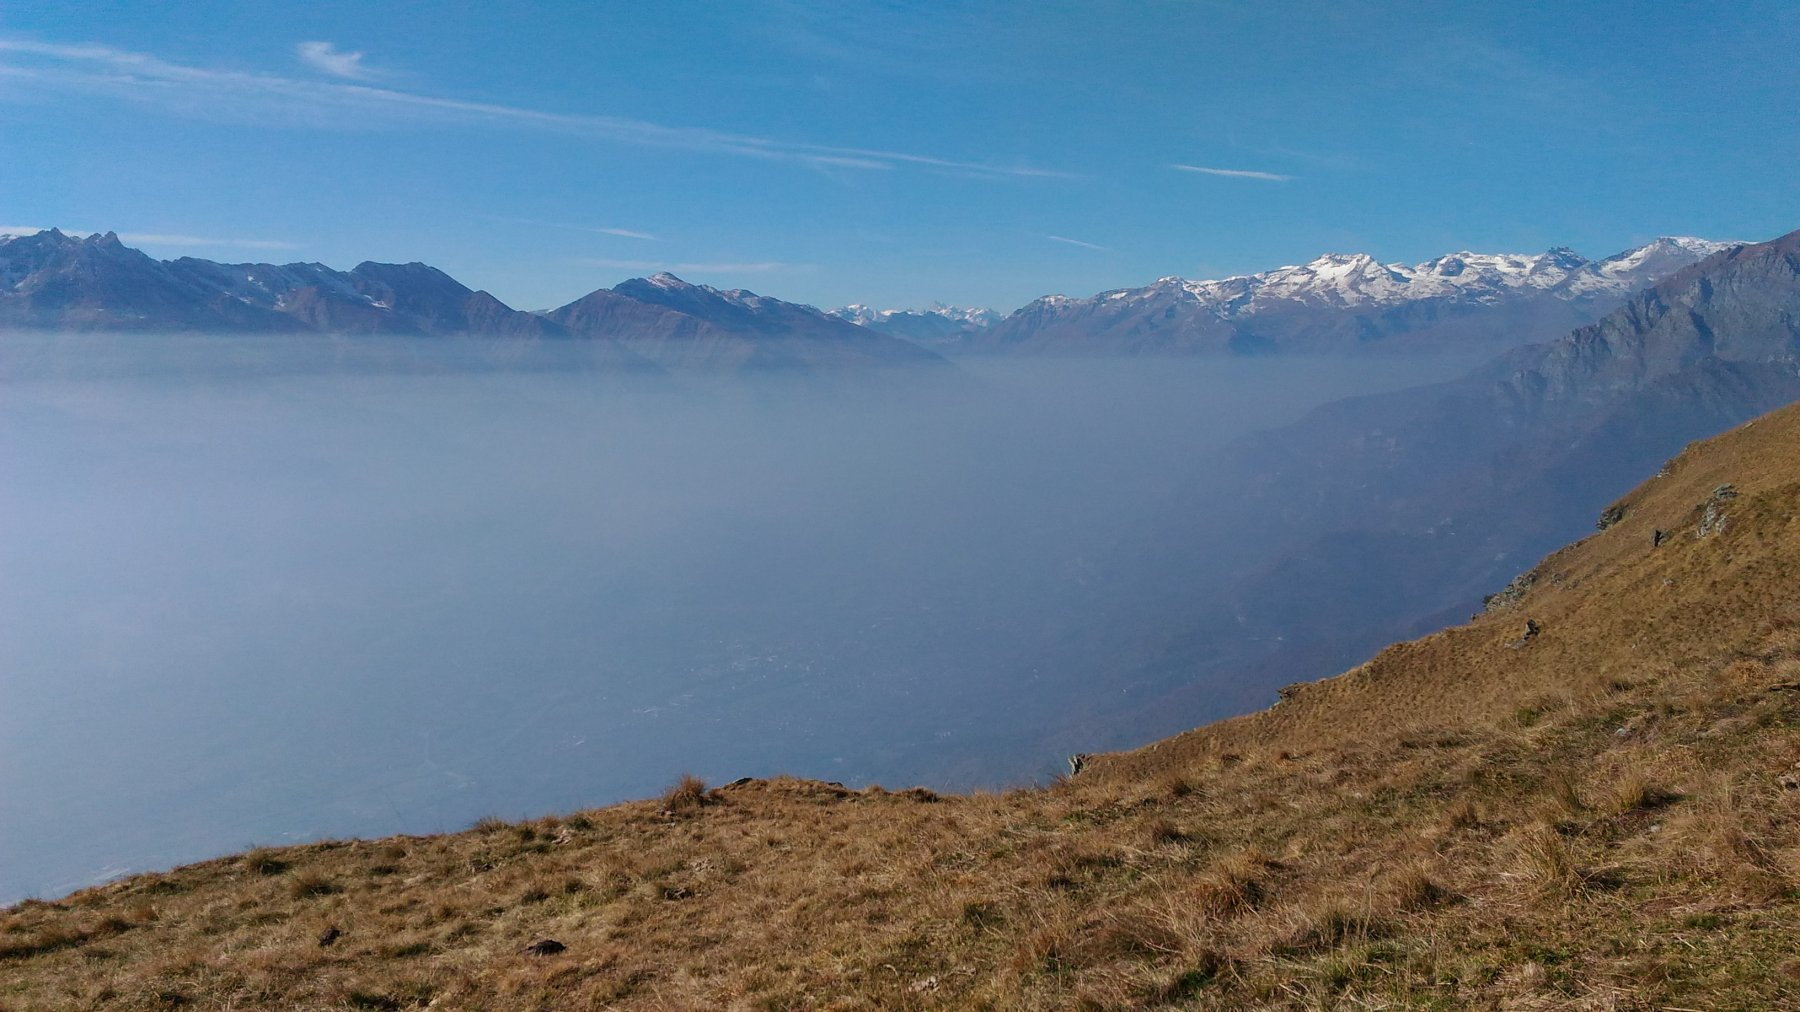 nebbie in valle di Susa